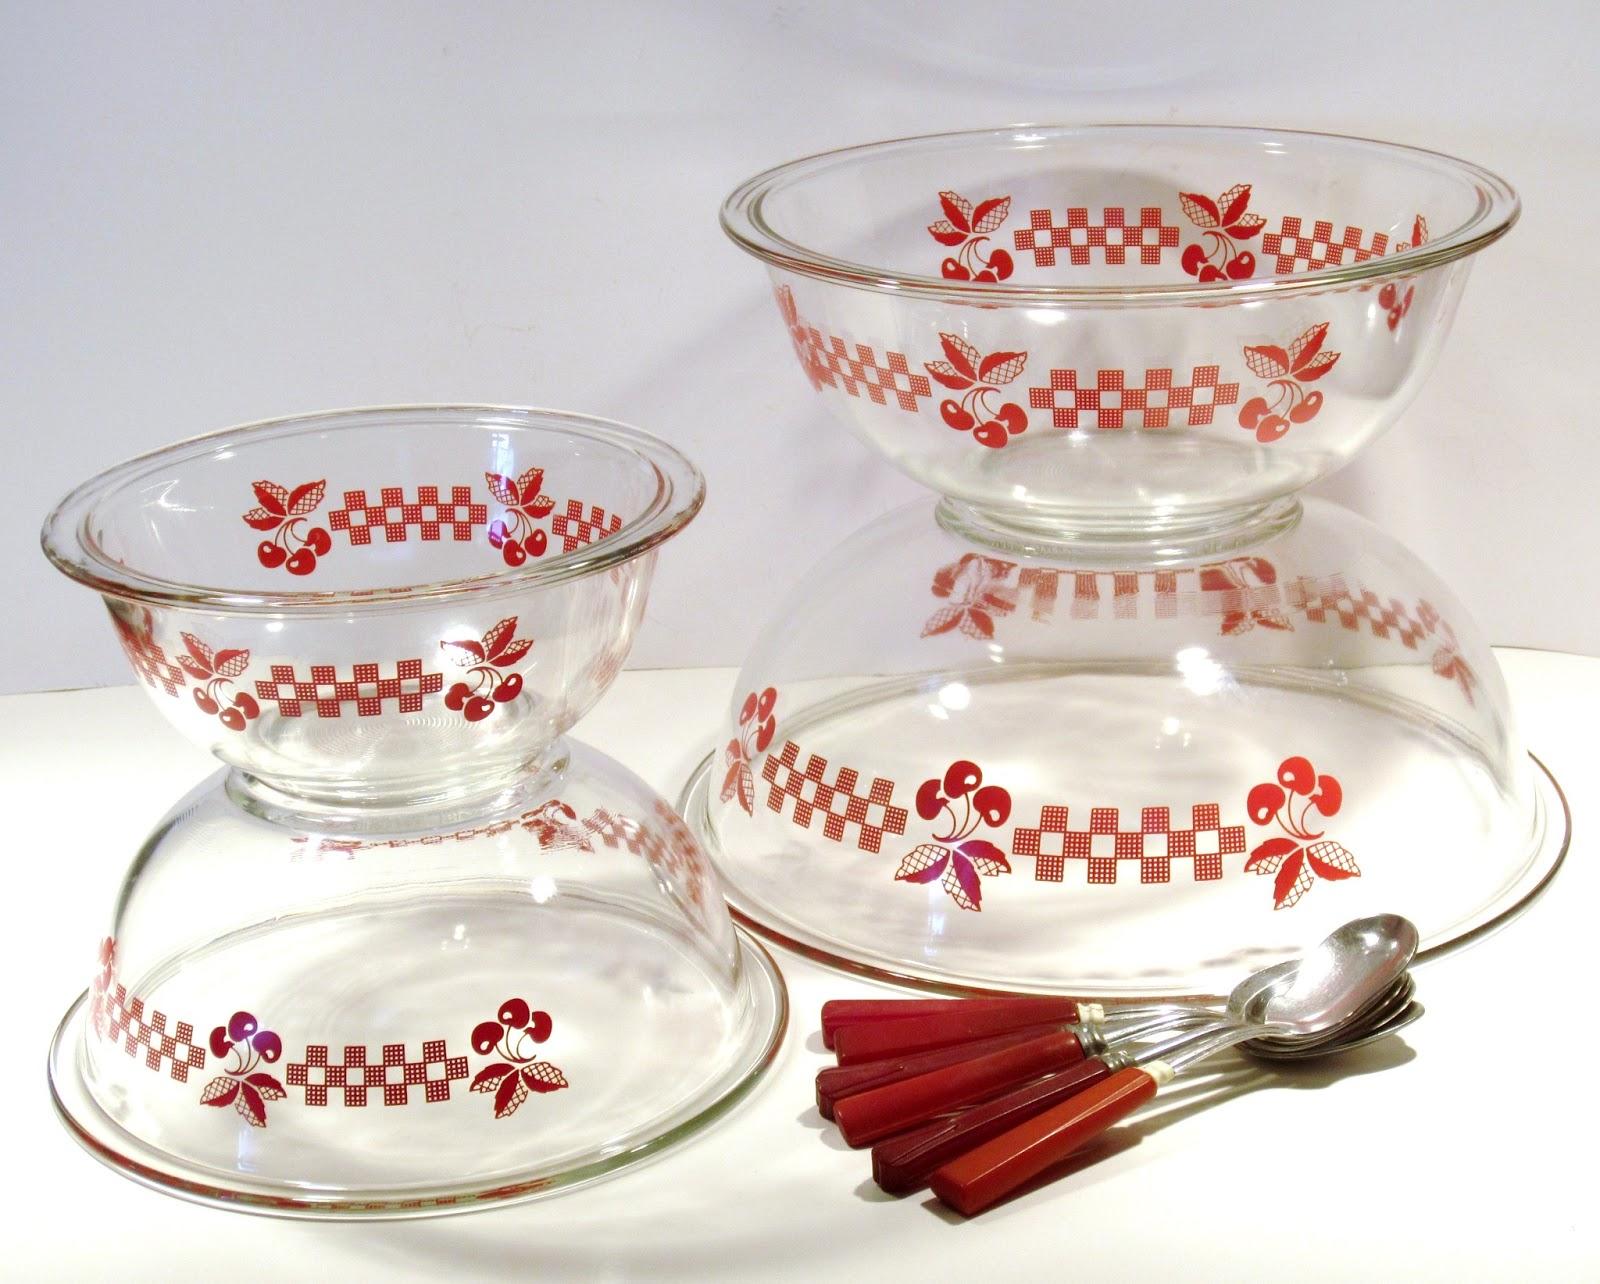 RunsWithScissors: Unusual Vintage Pyrex Mixing Bowls